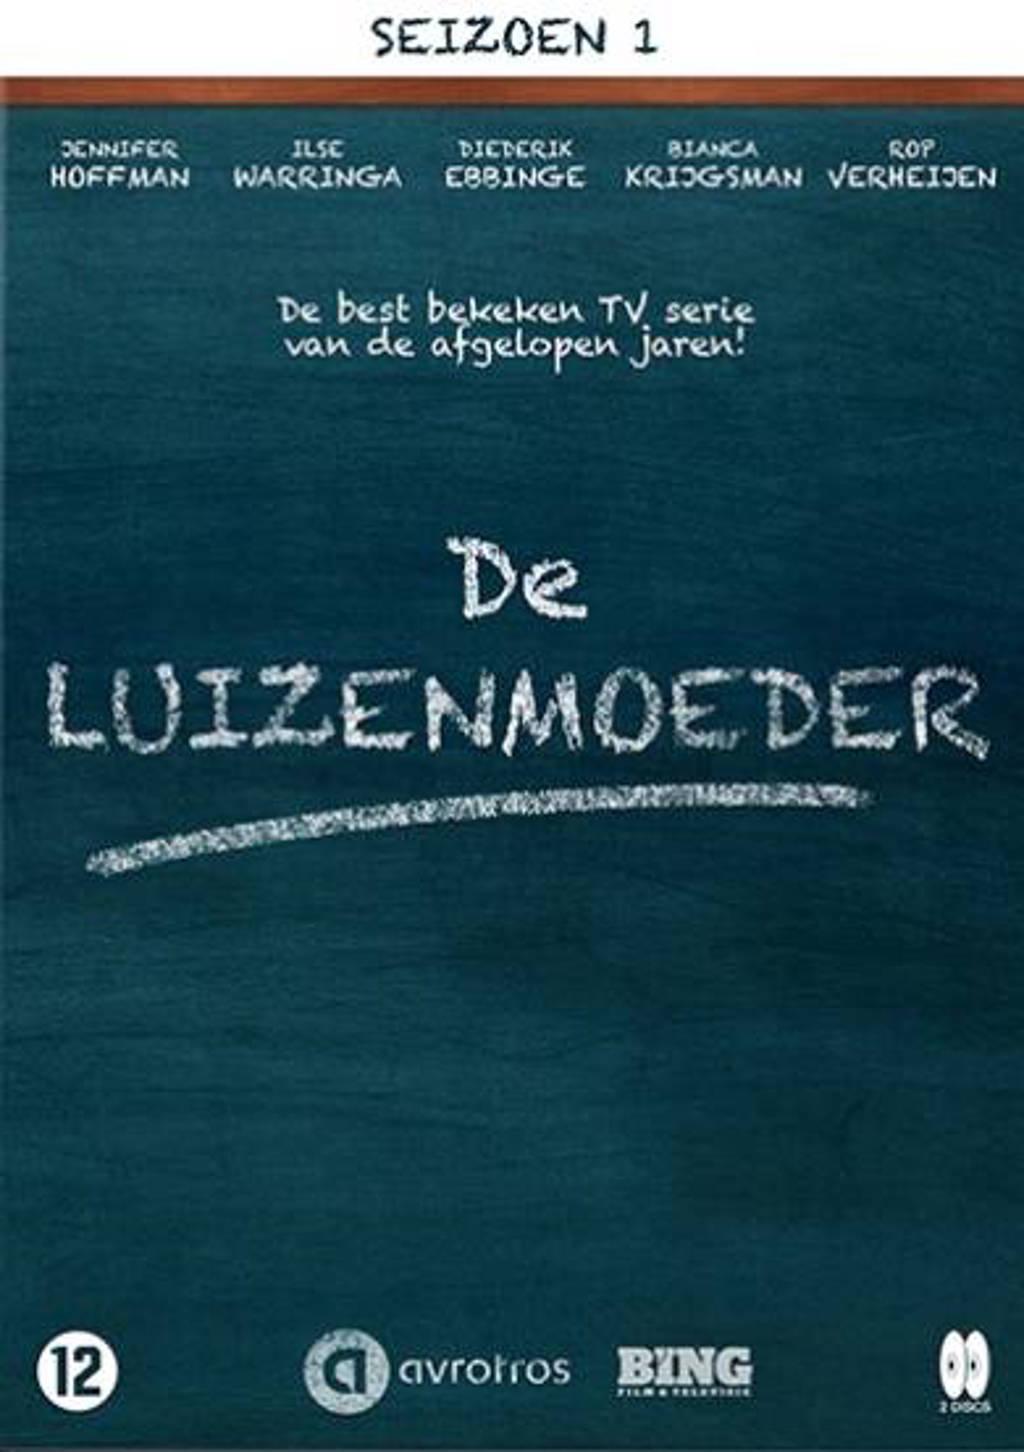 De luizenmoeder - Seizoen 1 (DVD)